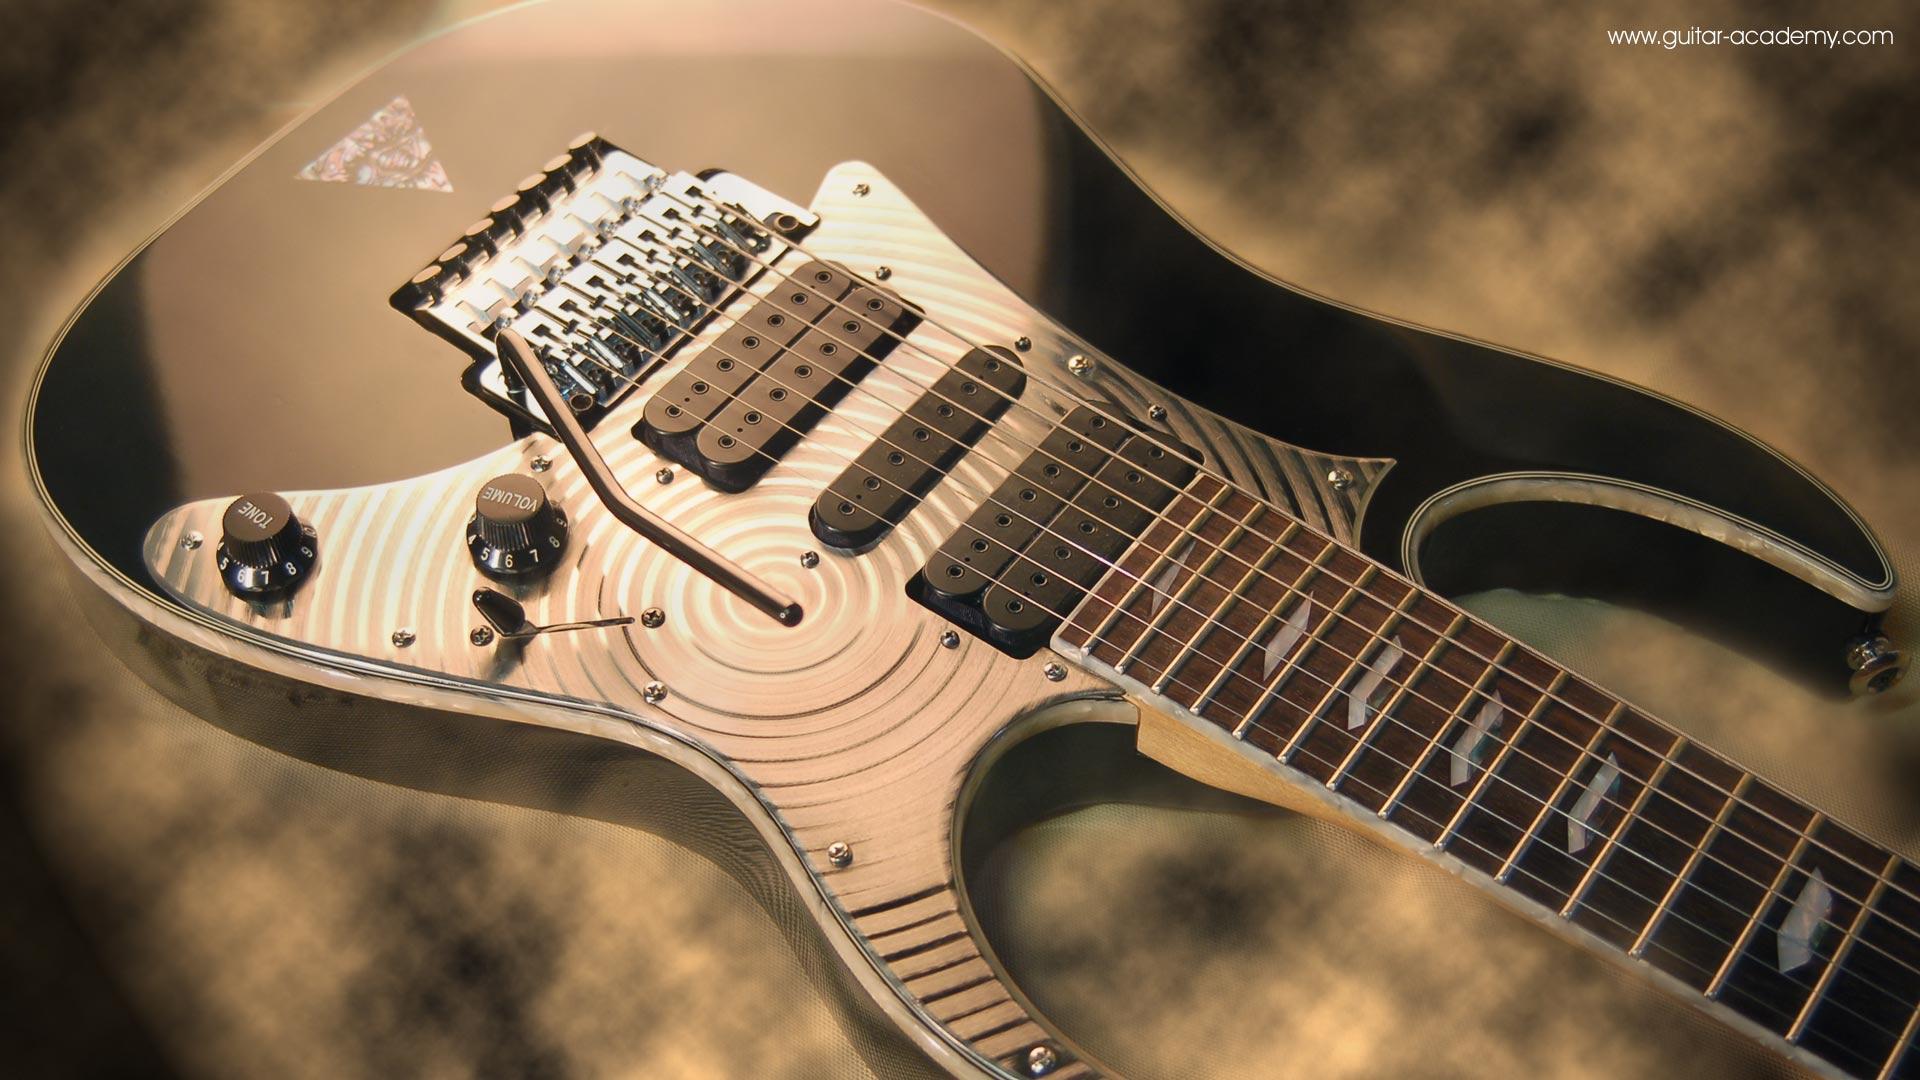 Guitar Image Hd Hd Background Wallpaper 20 HD Wallpapers | www ...